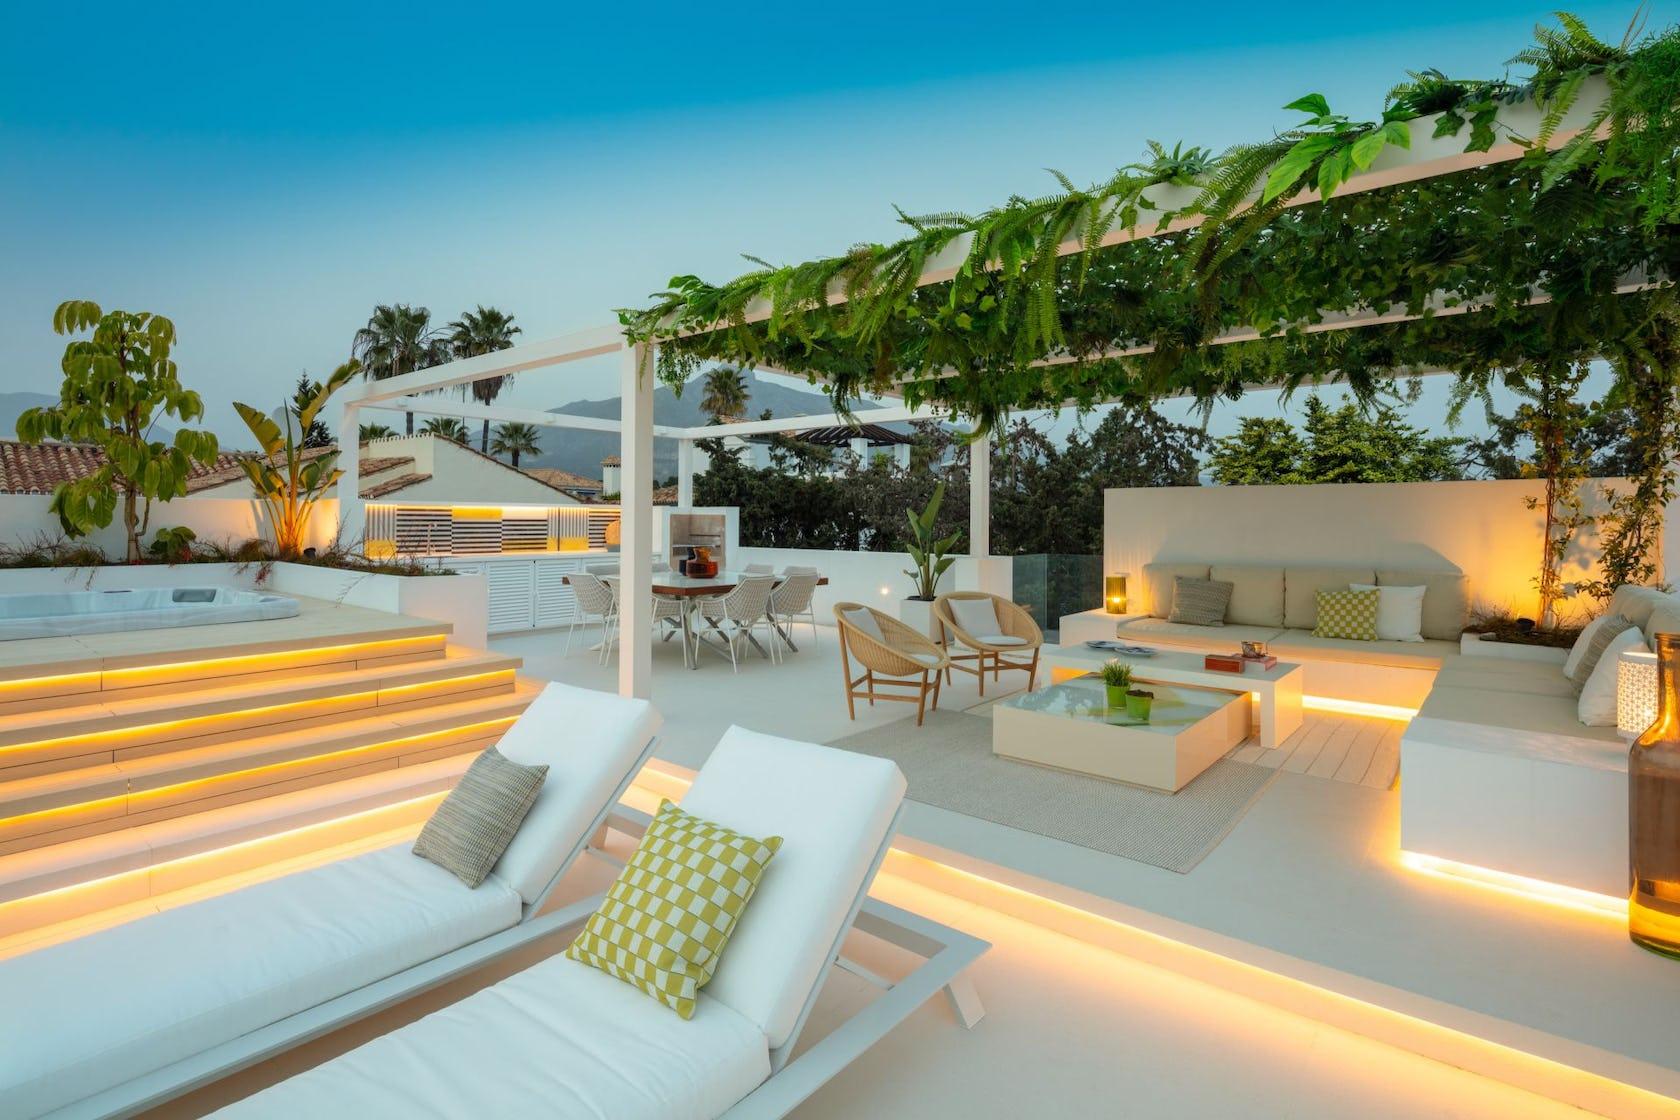 terrace patio pillow cushion interior design indoors chair furniture